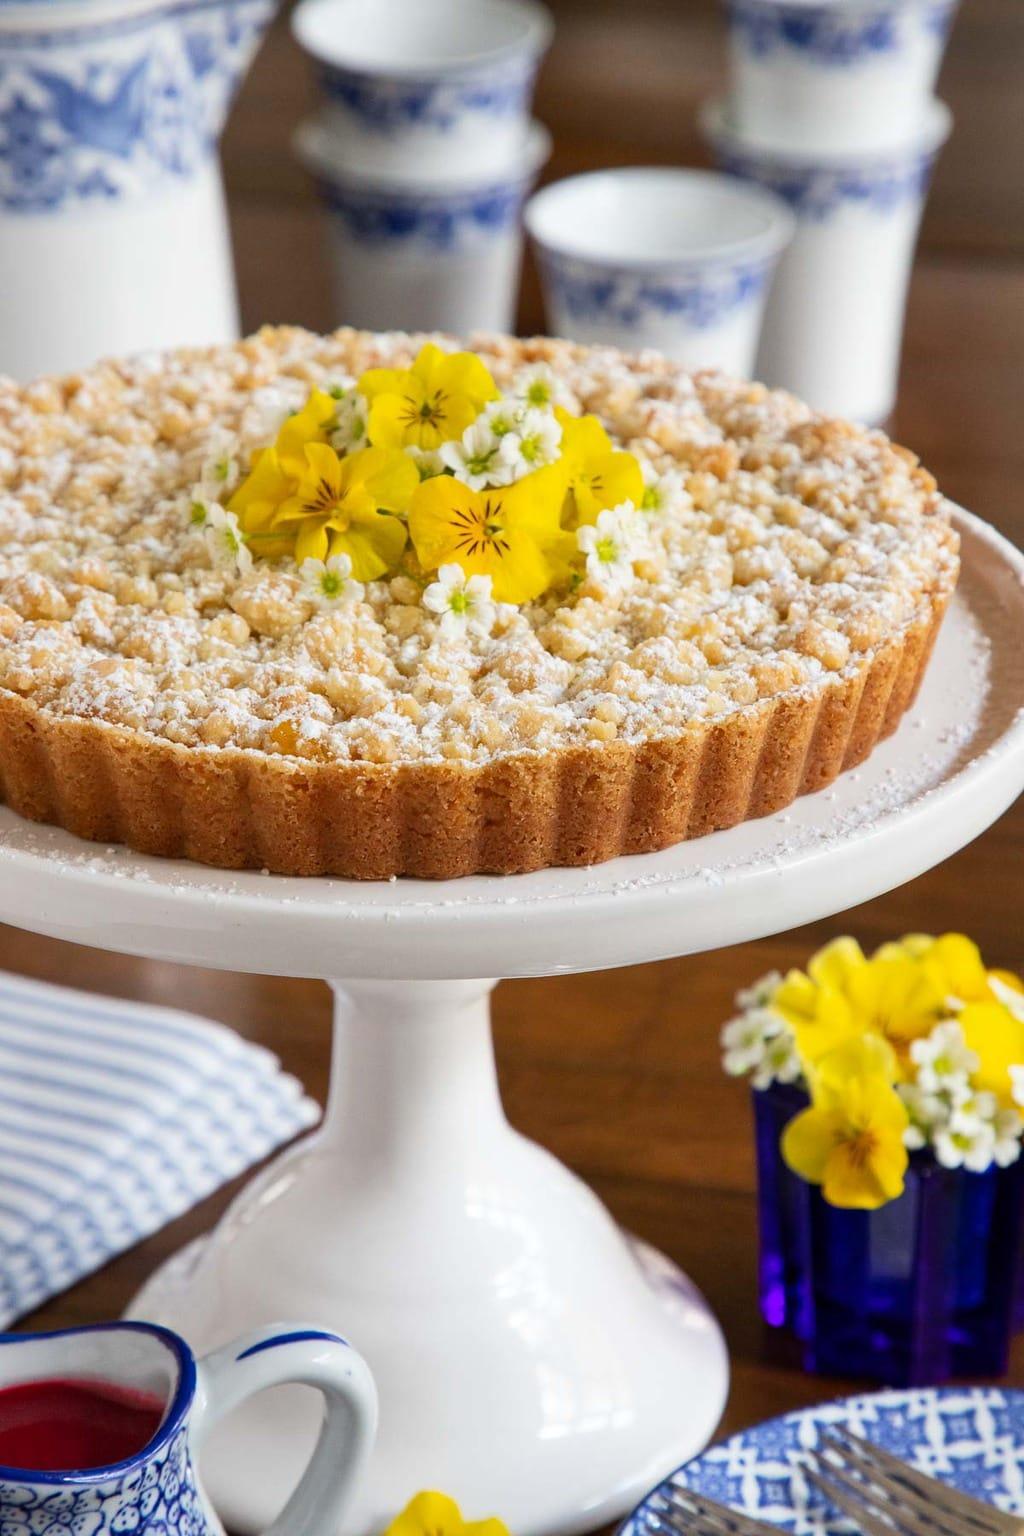 Photo of a Lemon Curd Shortbread Tart on a white cake pedestal platter.